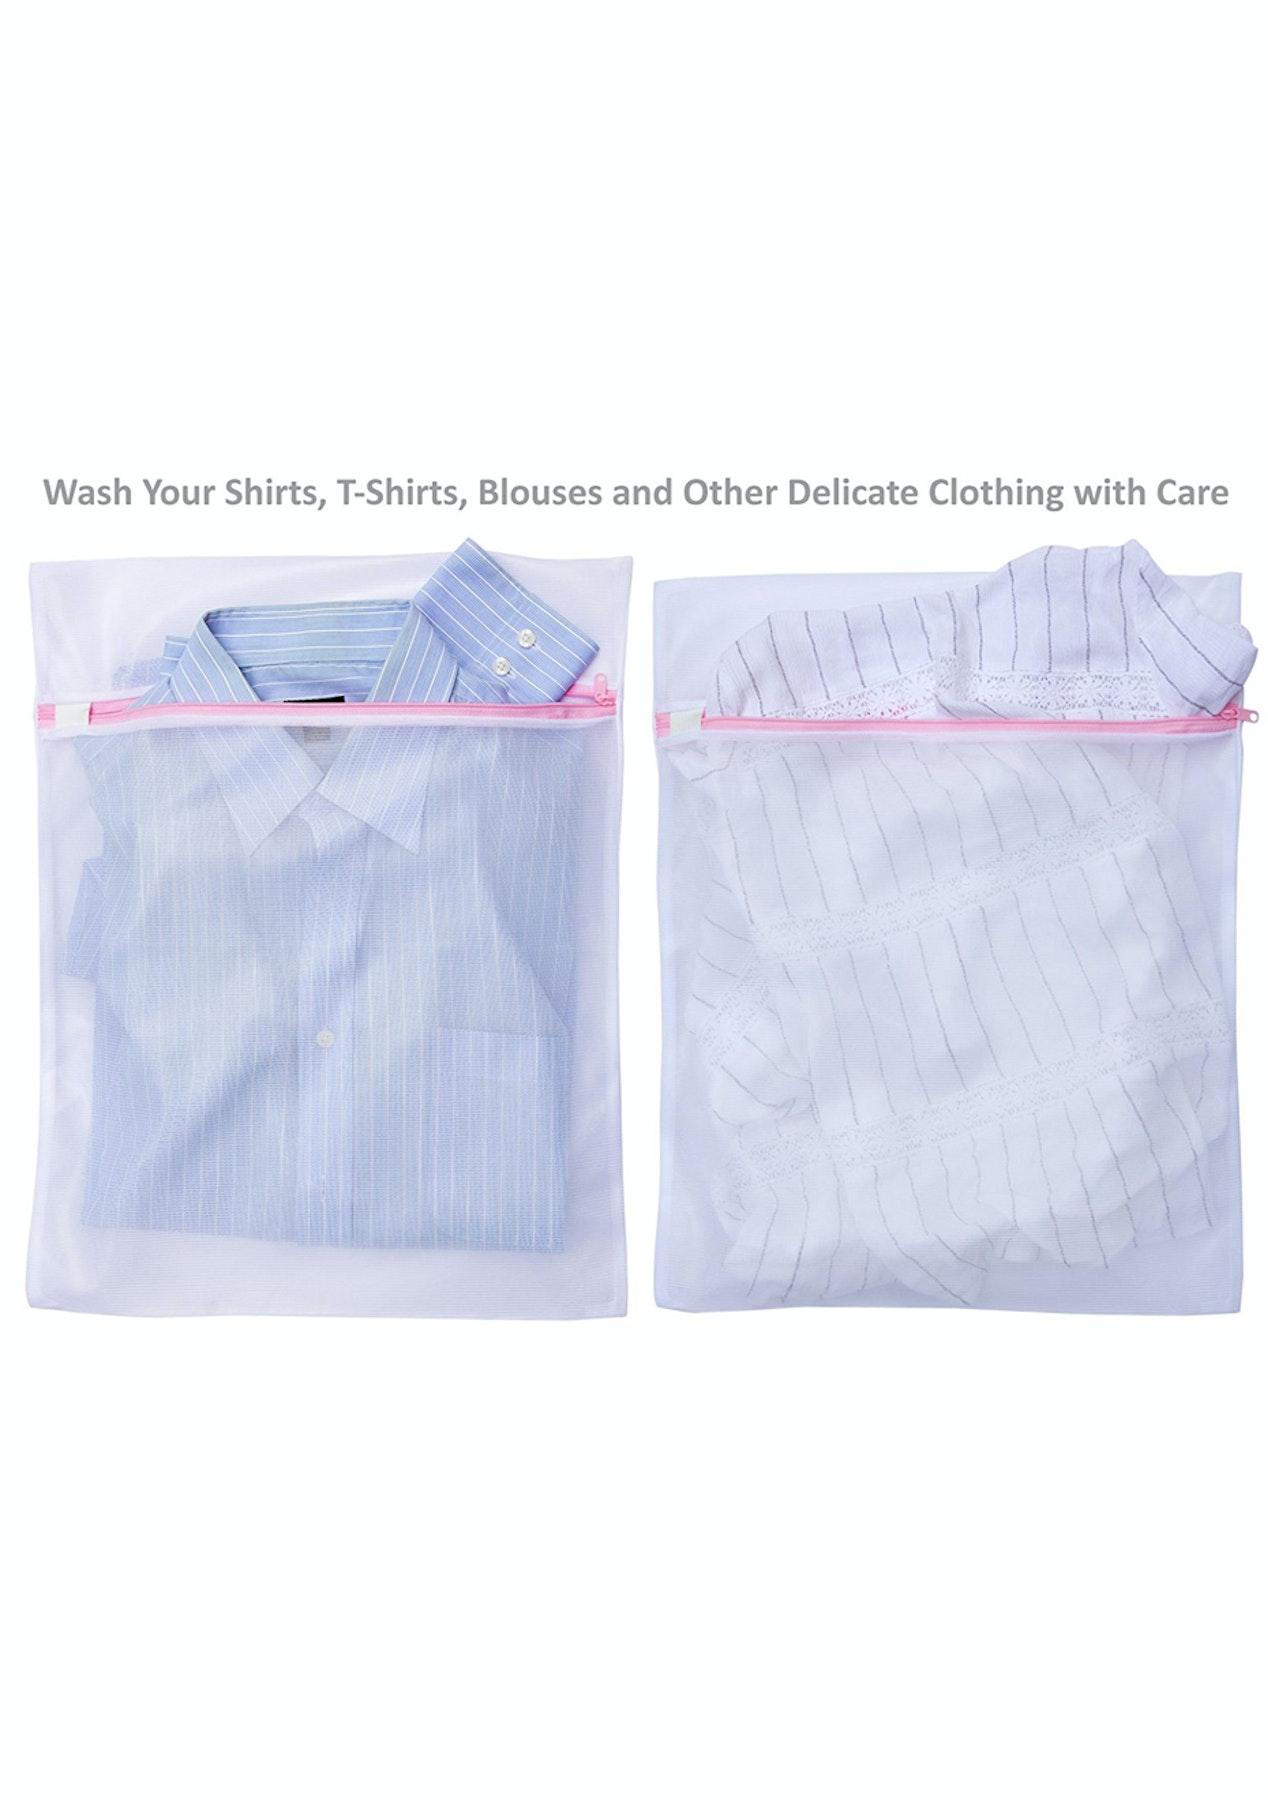 285cc1e5608e Fine Mesh Laundry Bags